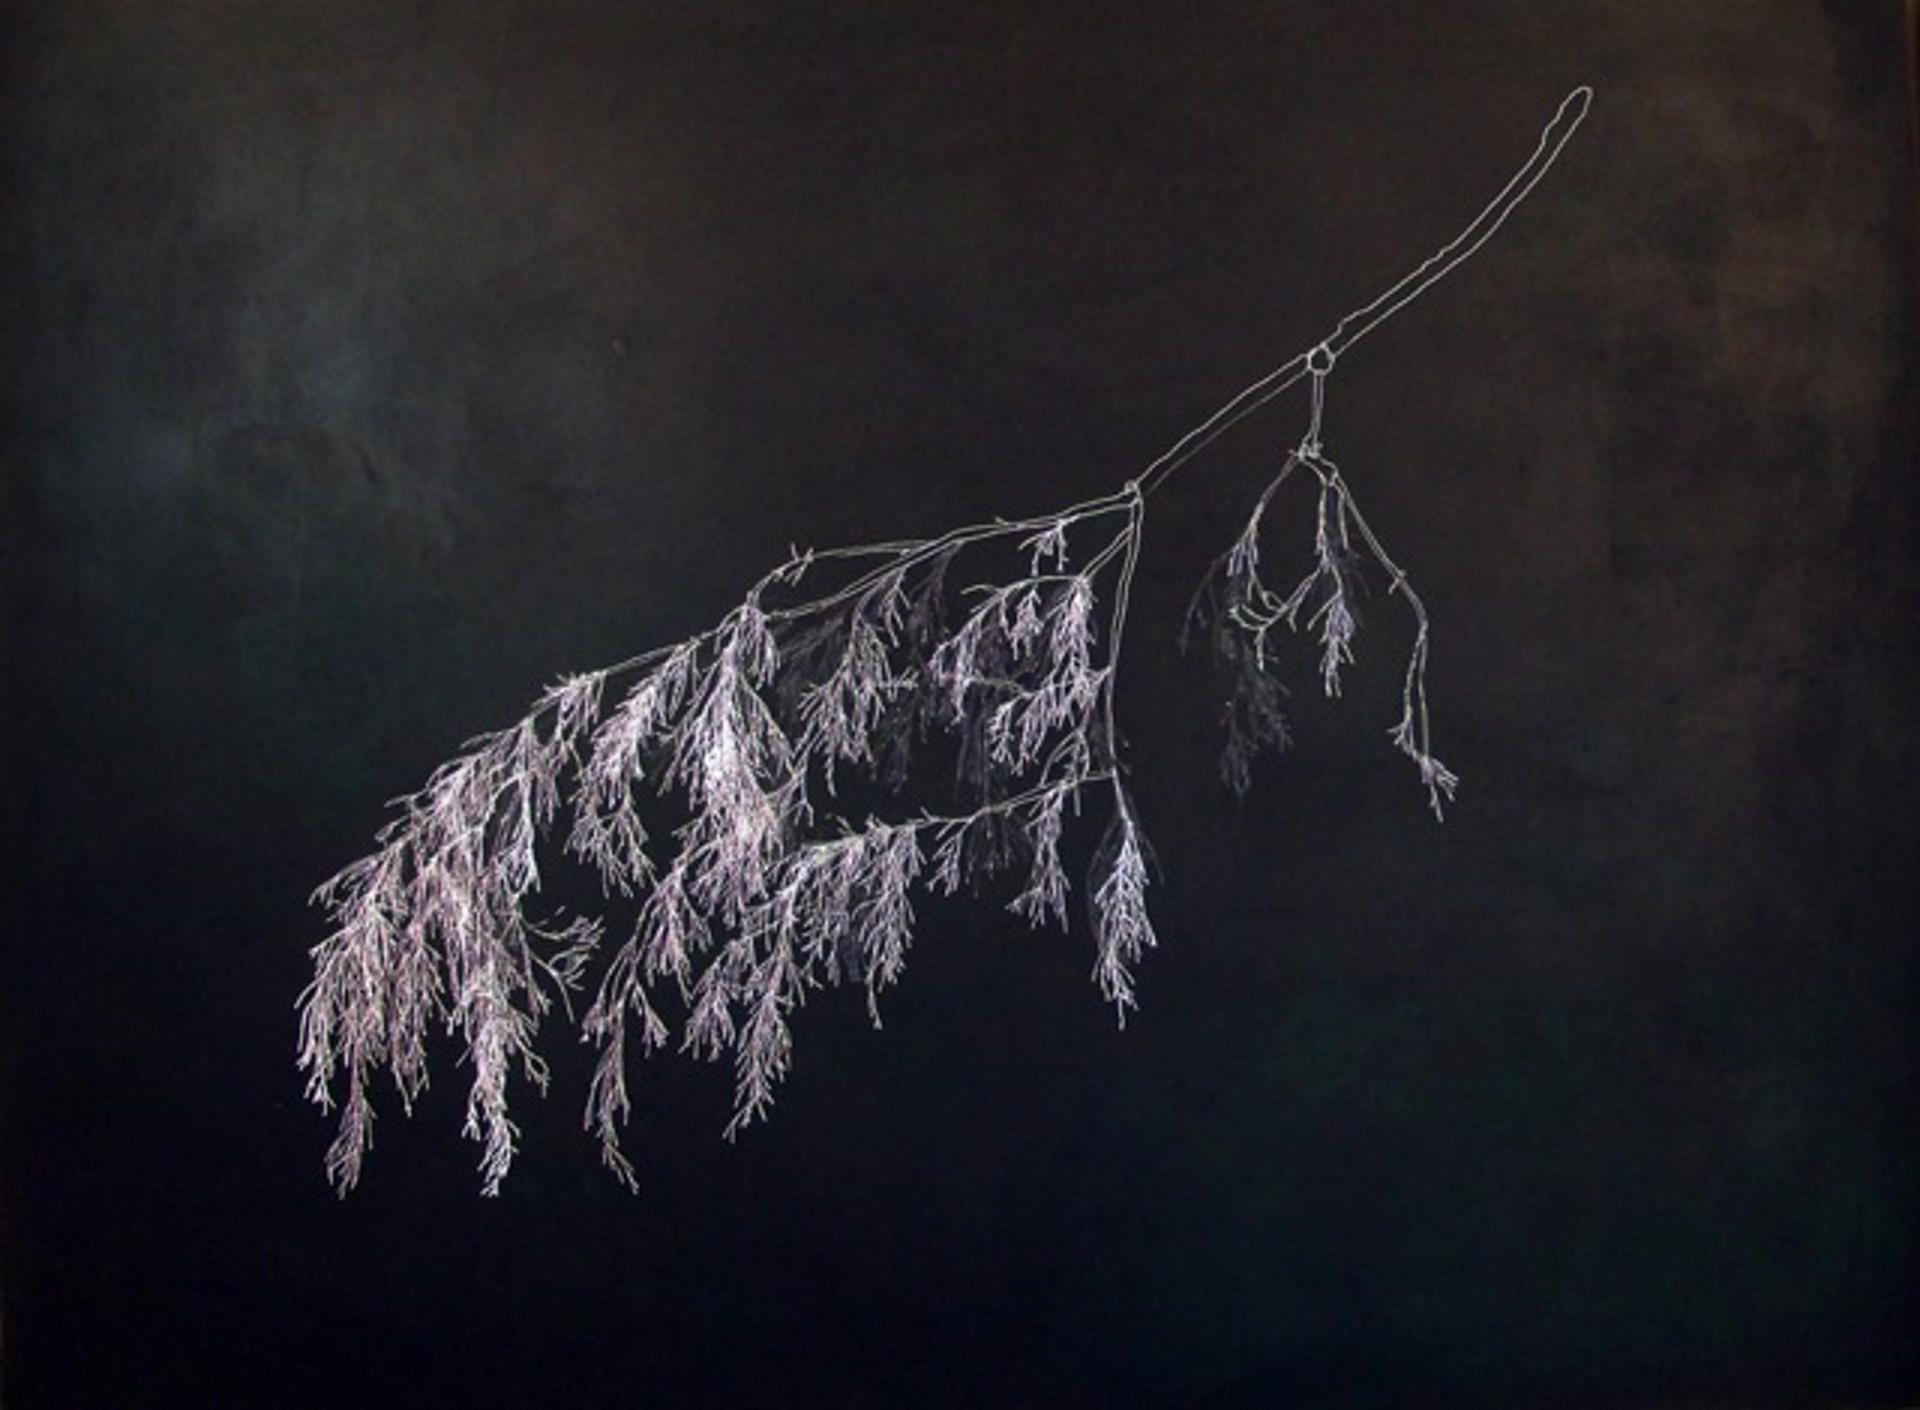 4,450 (Parts of a Twig) by John Adelman